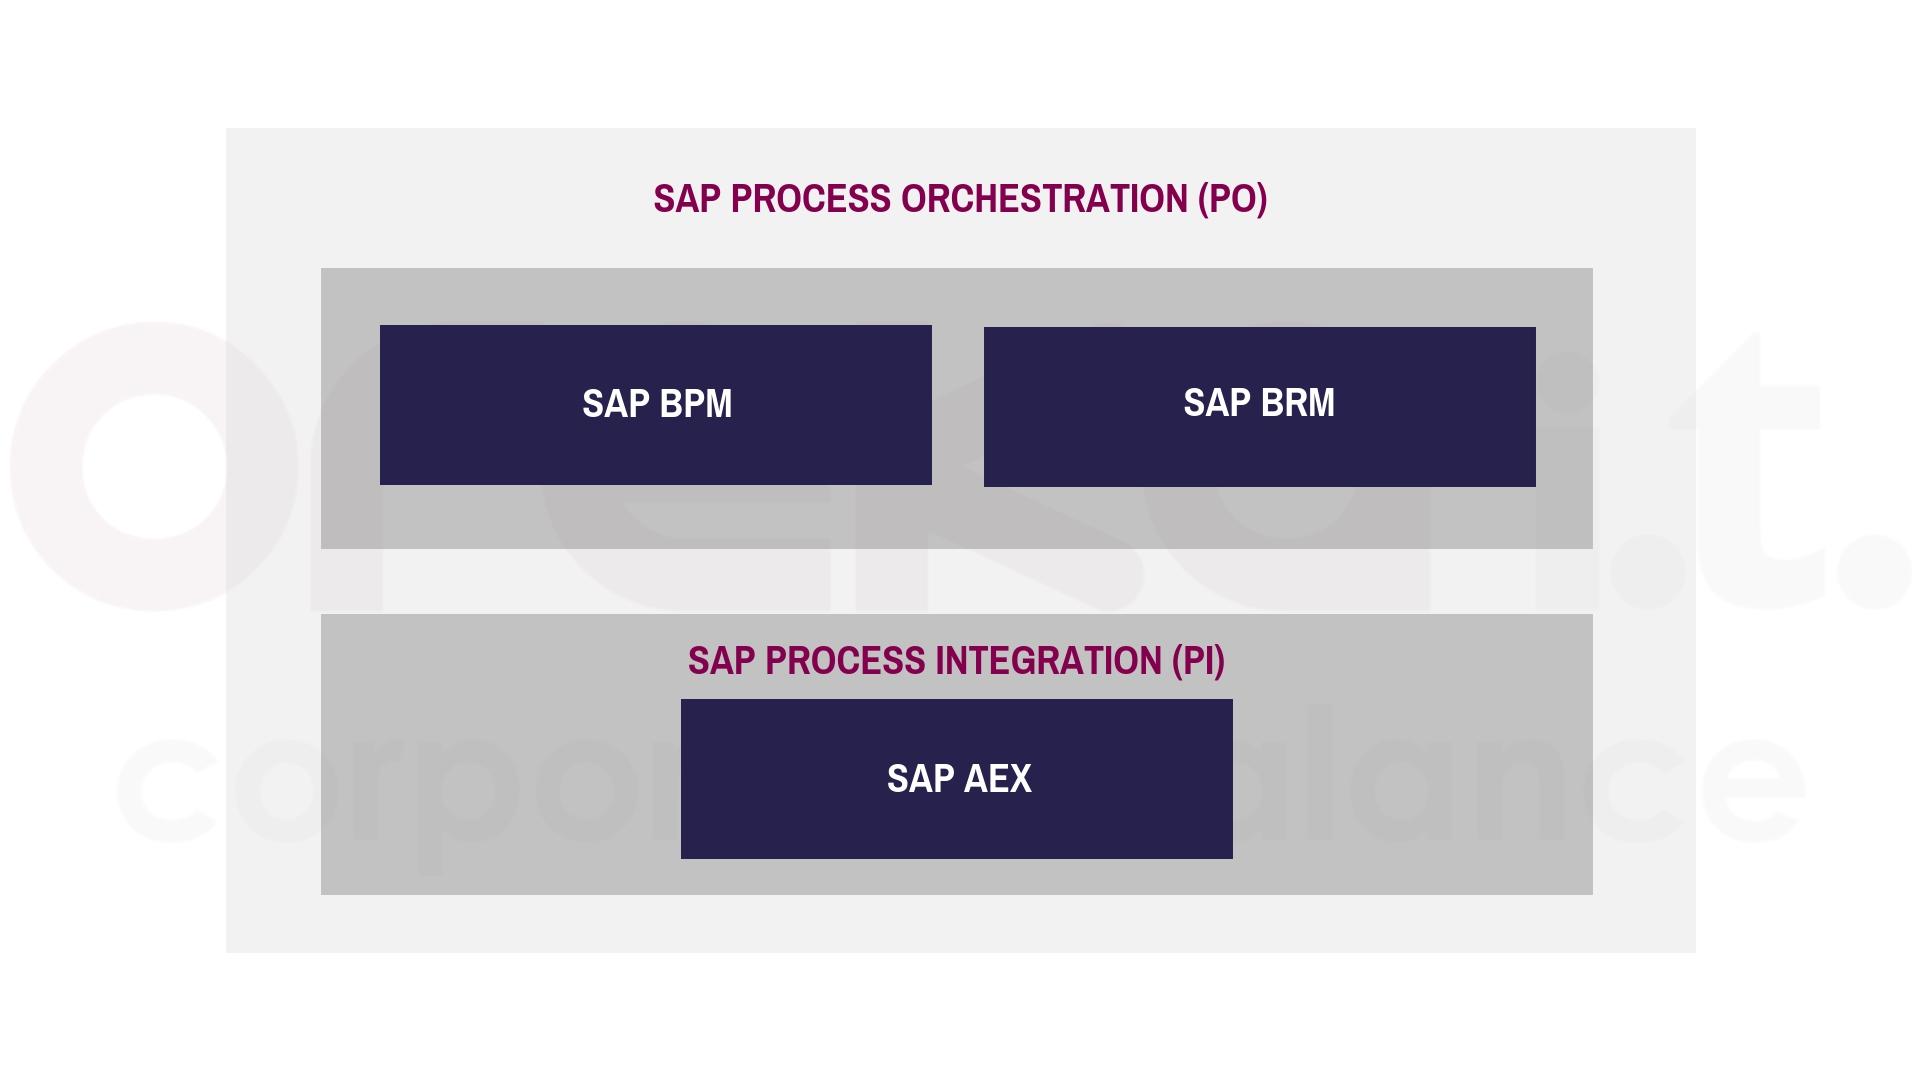 Diez razones para migrar a SAP PO (2)